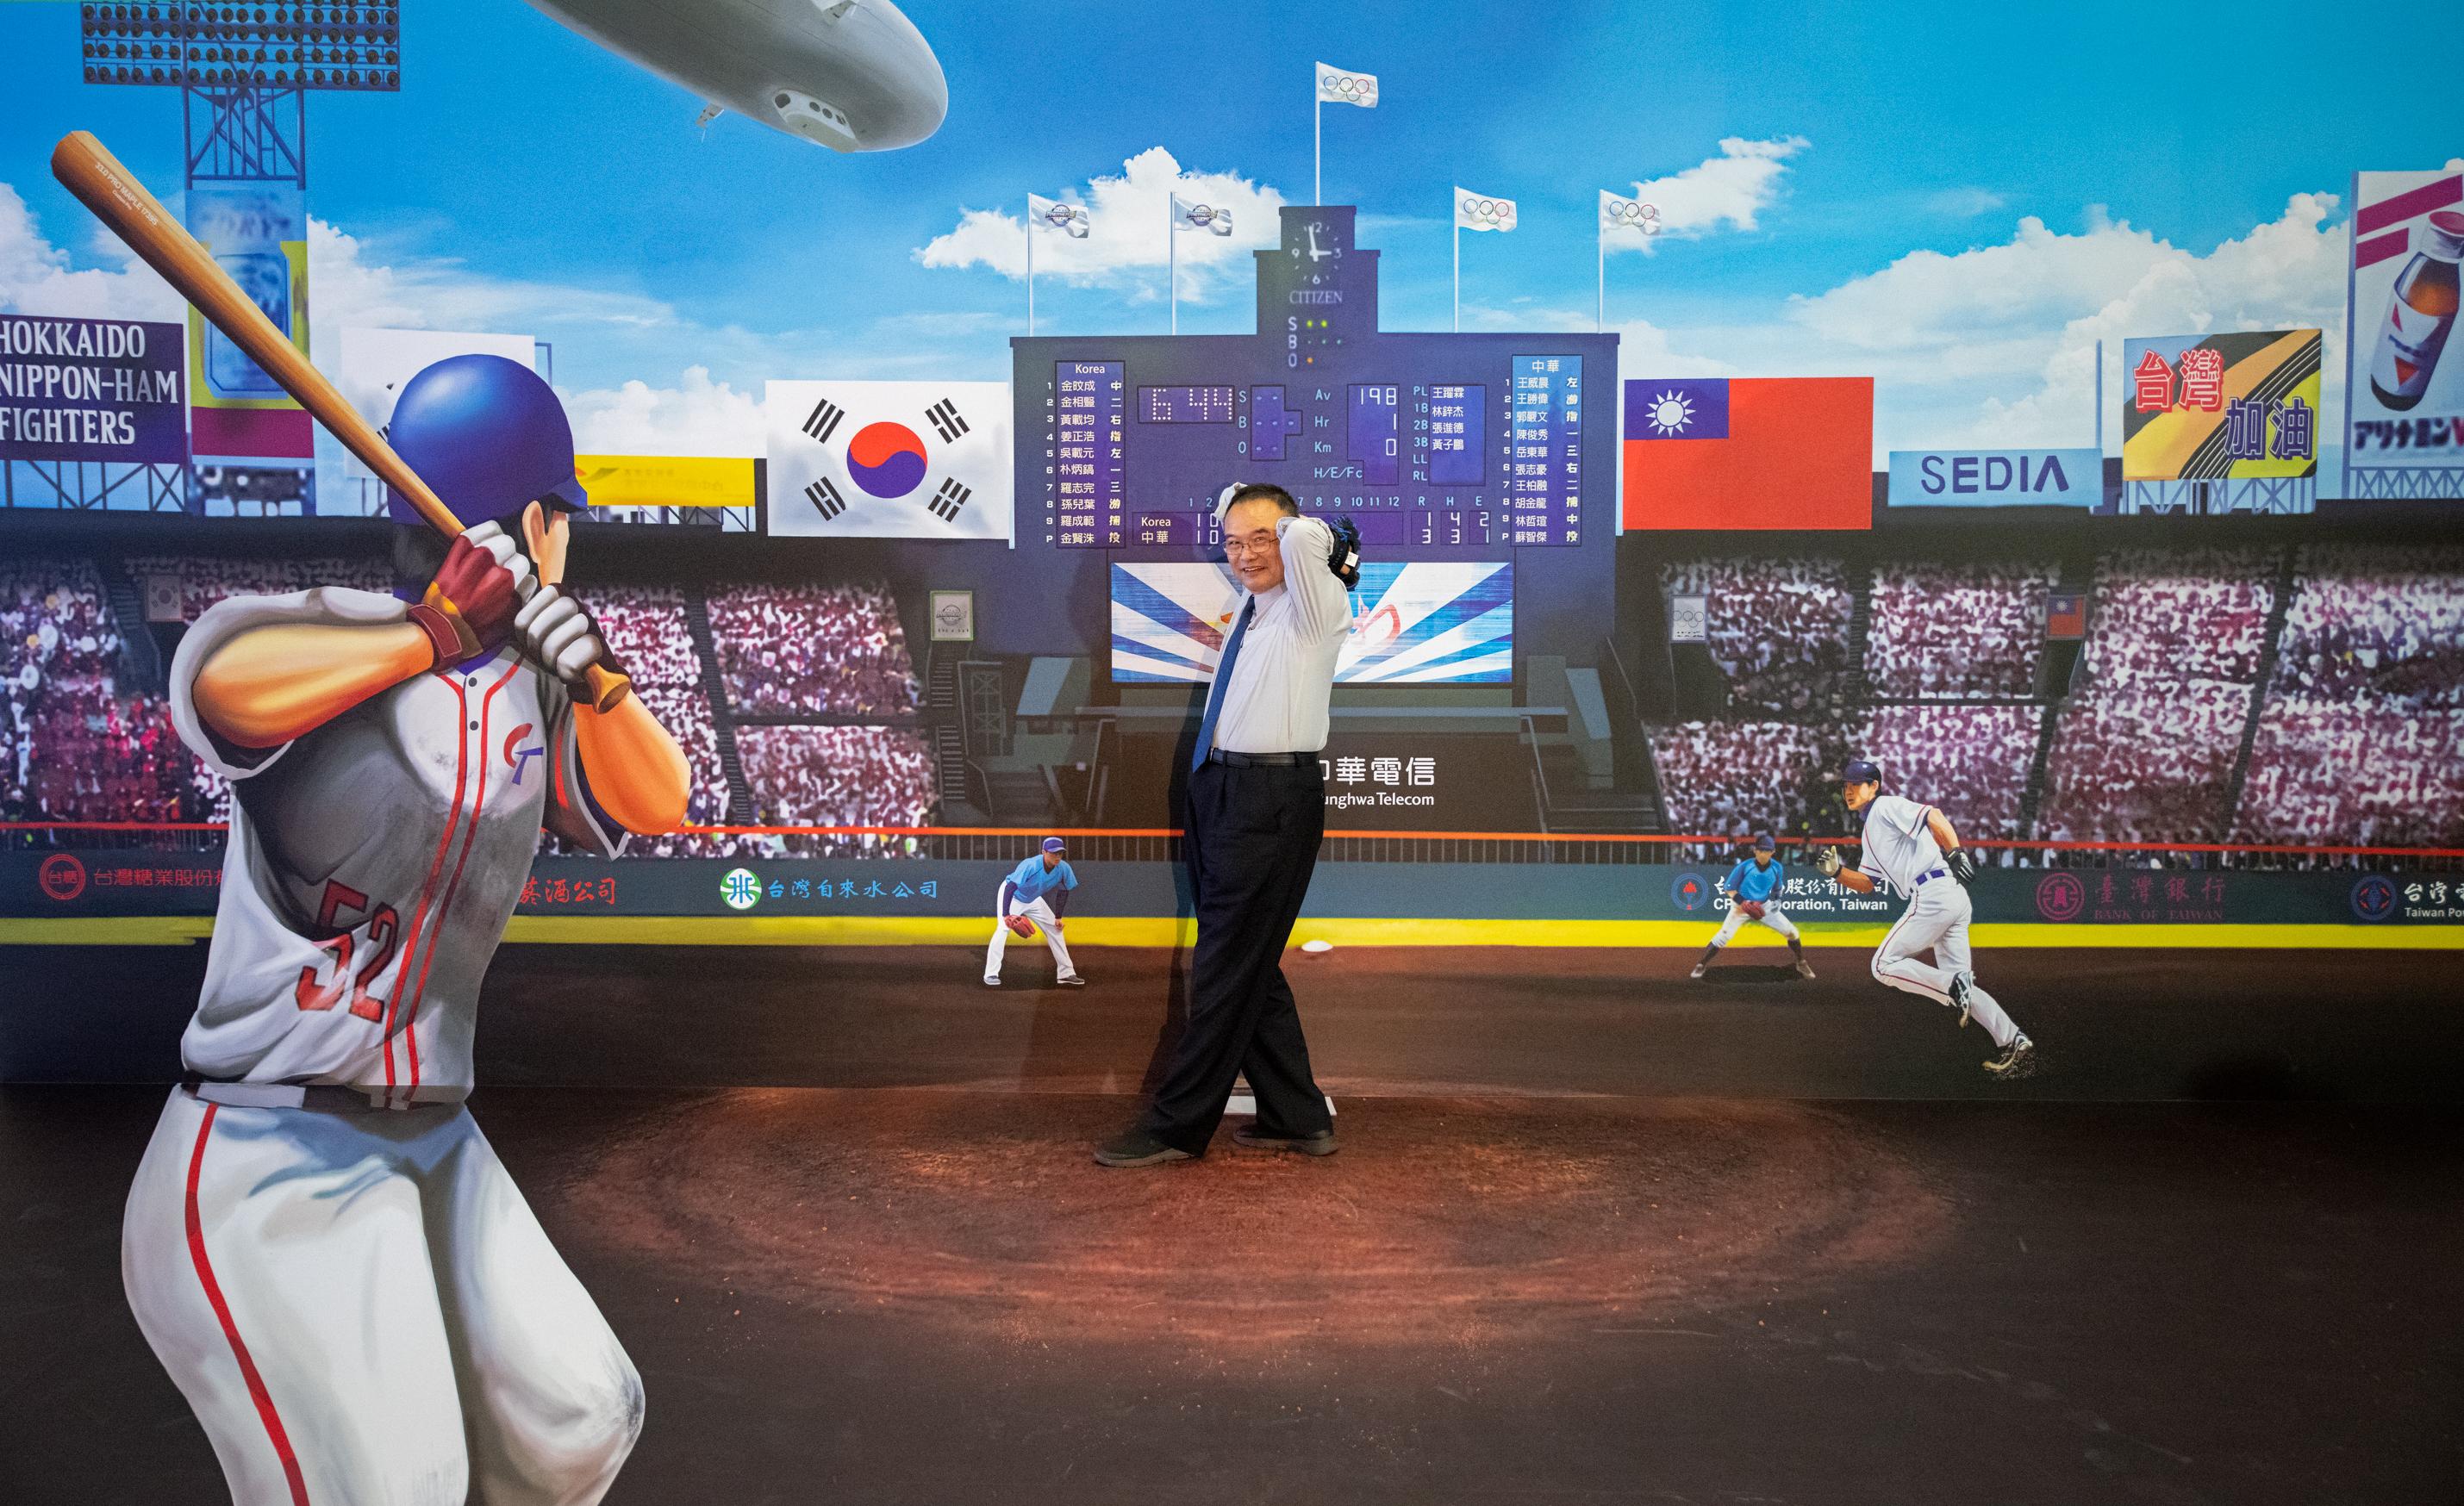 20200925「3D視角‧EYE TAIWAN」開幕典禮-蕭政次宗煌與作品合影